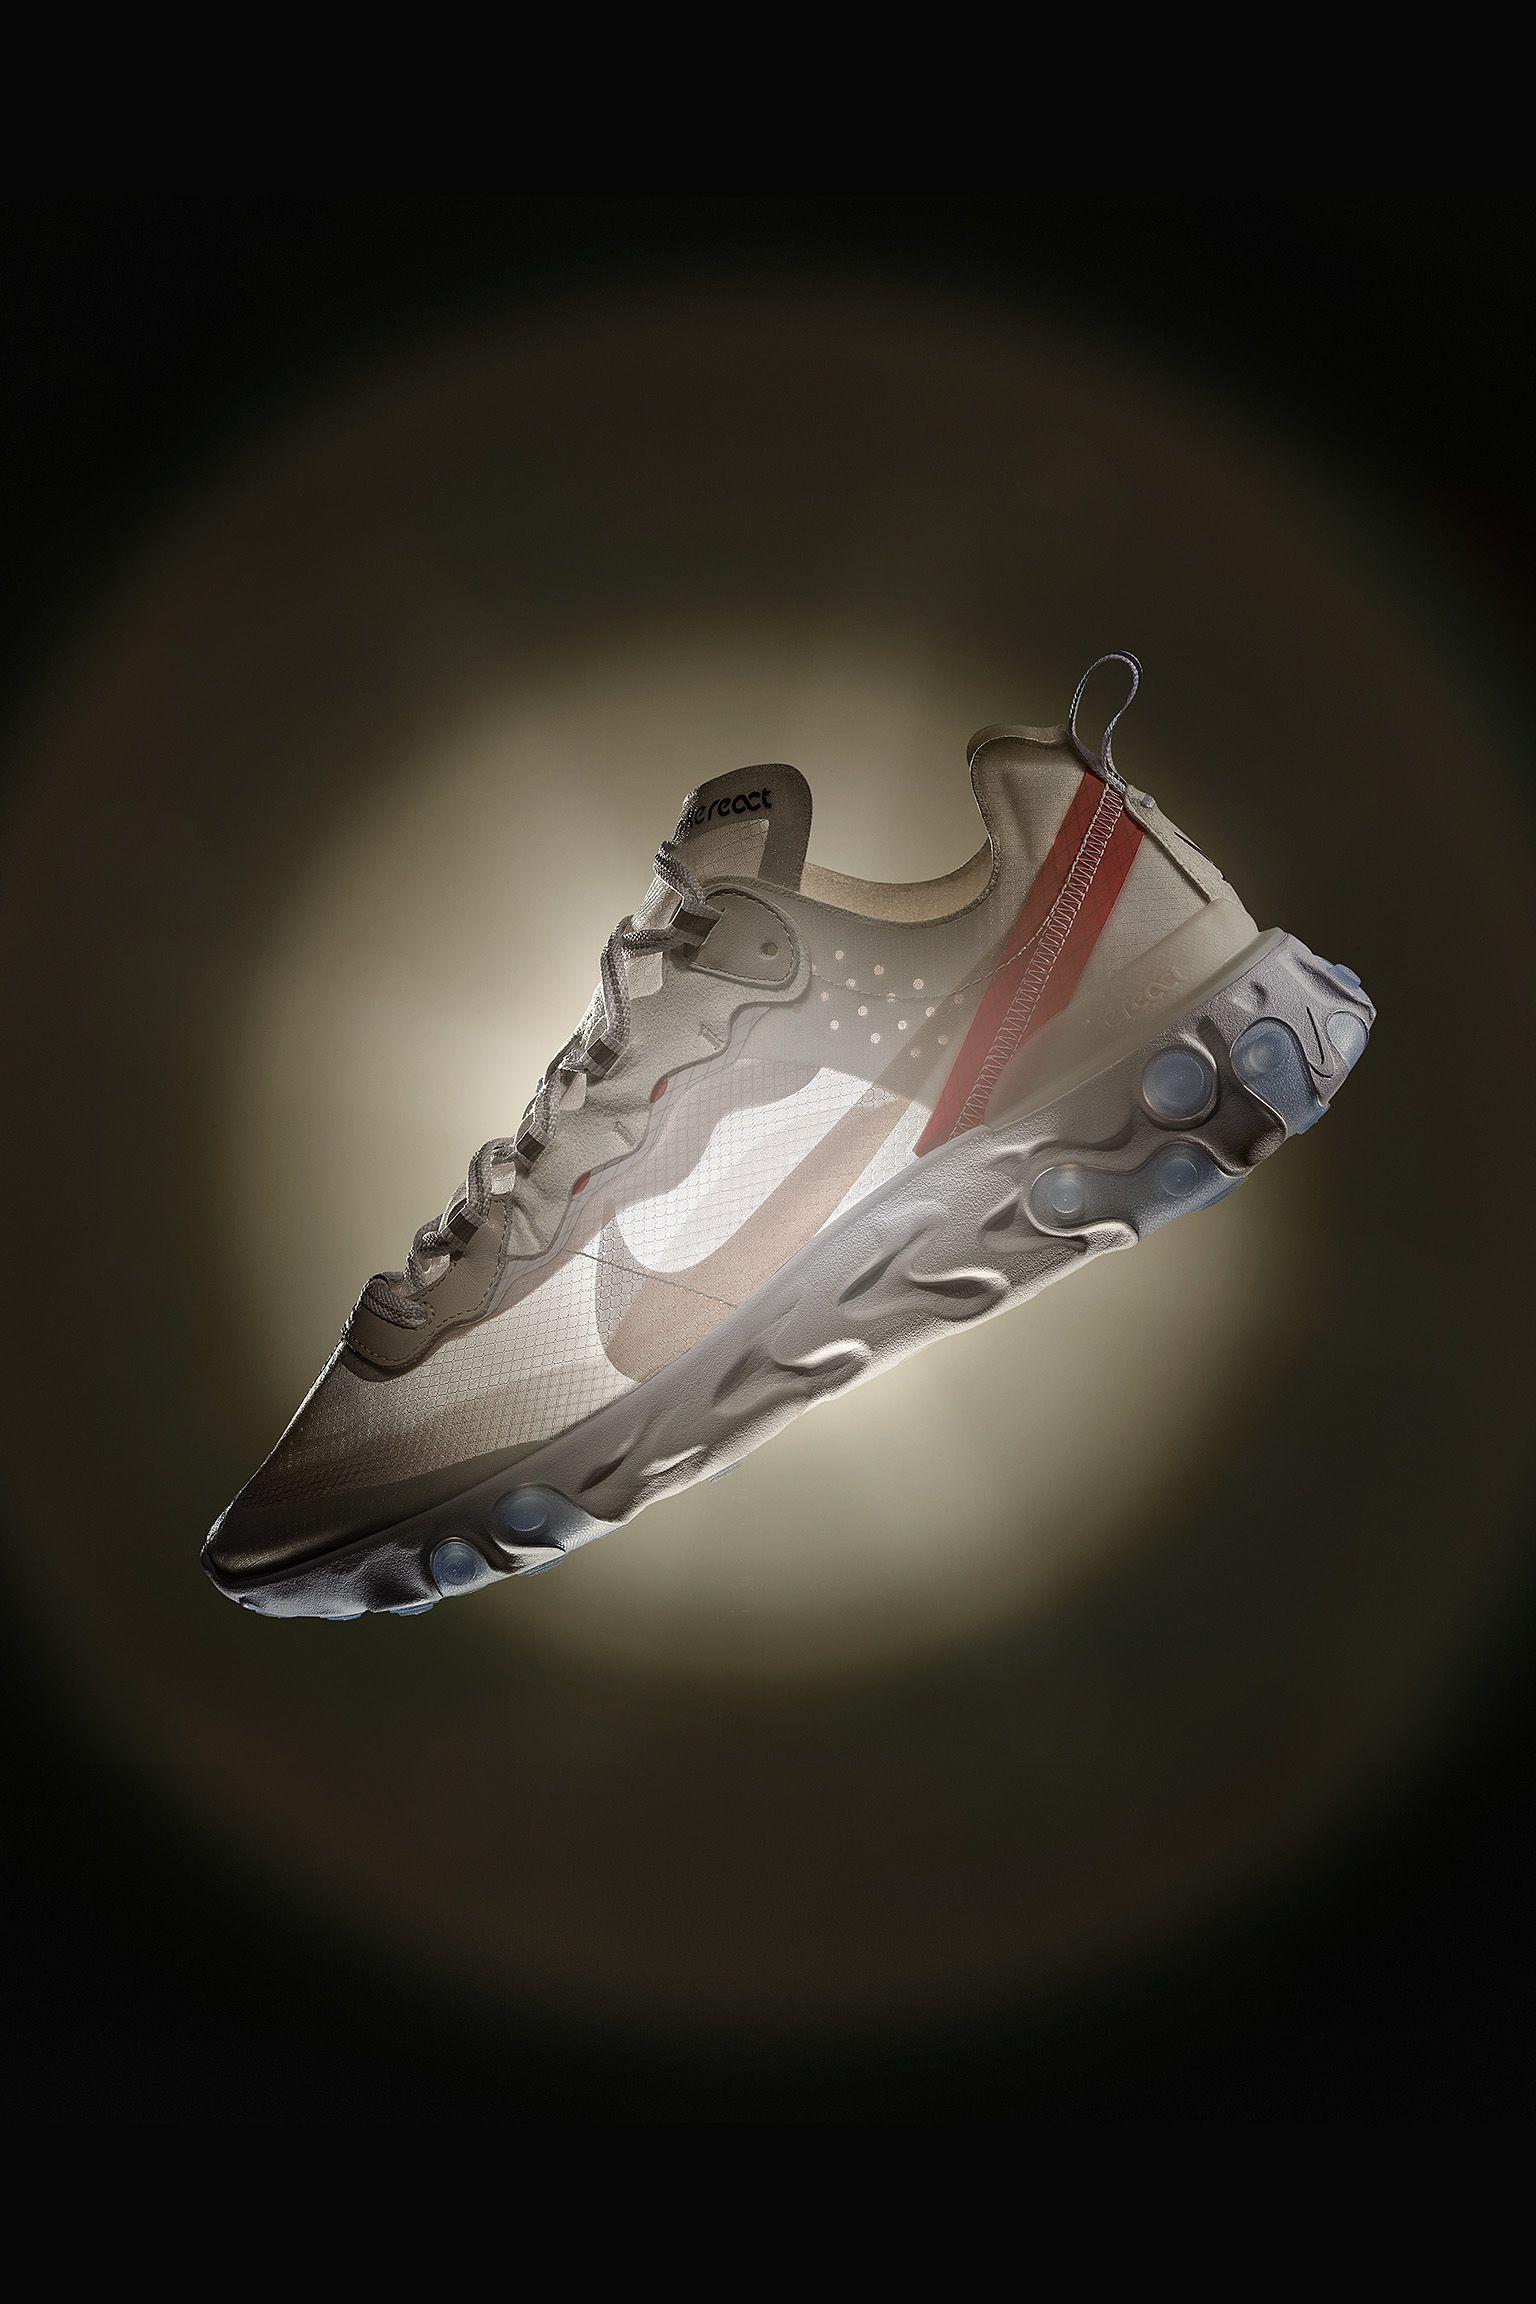 0ccea3b2d75 Tajemství designu  React Element 87. Nike+ SNKRS CZ